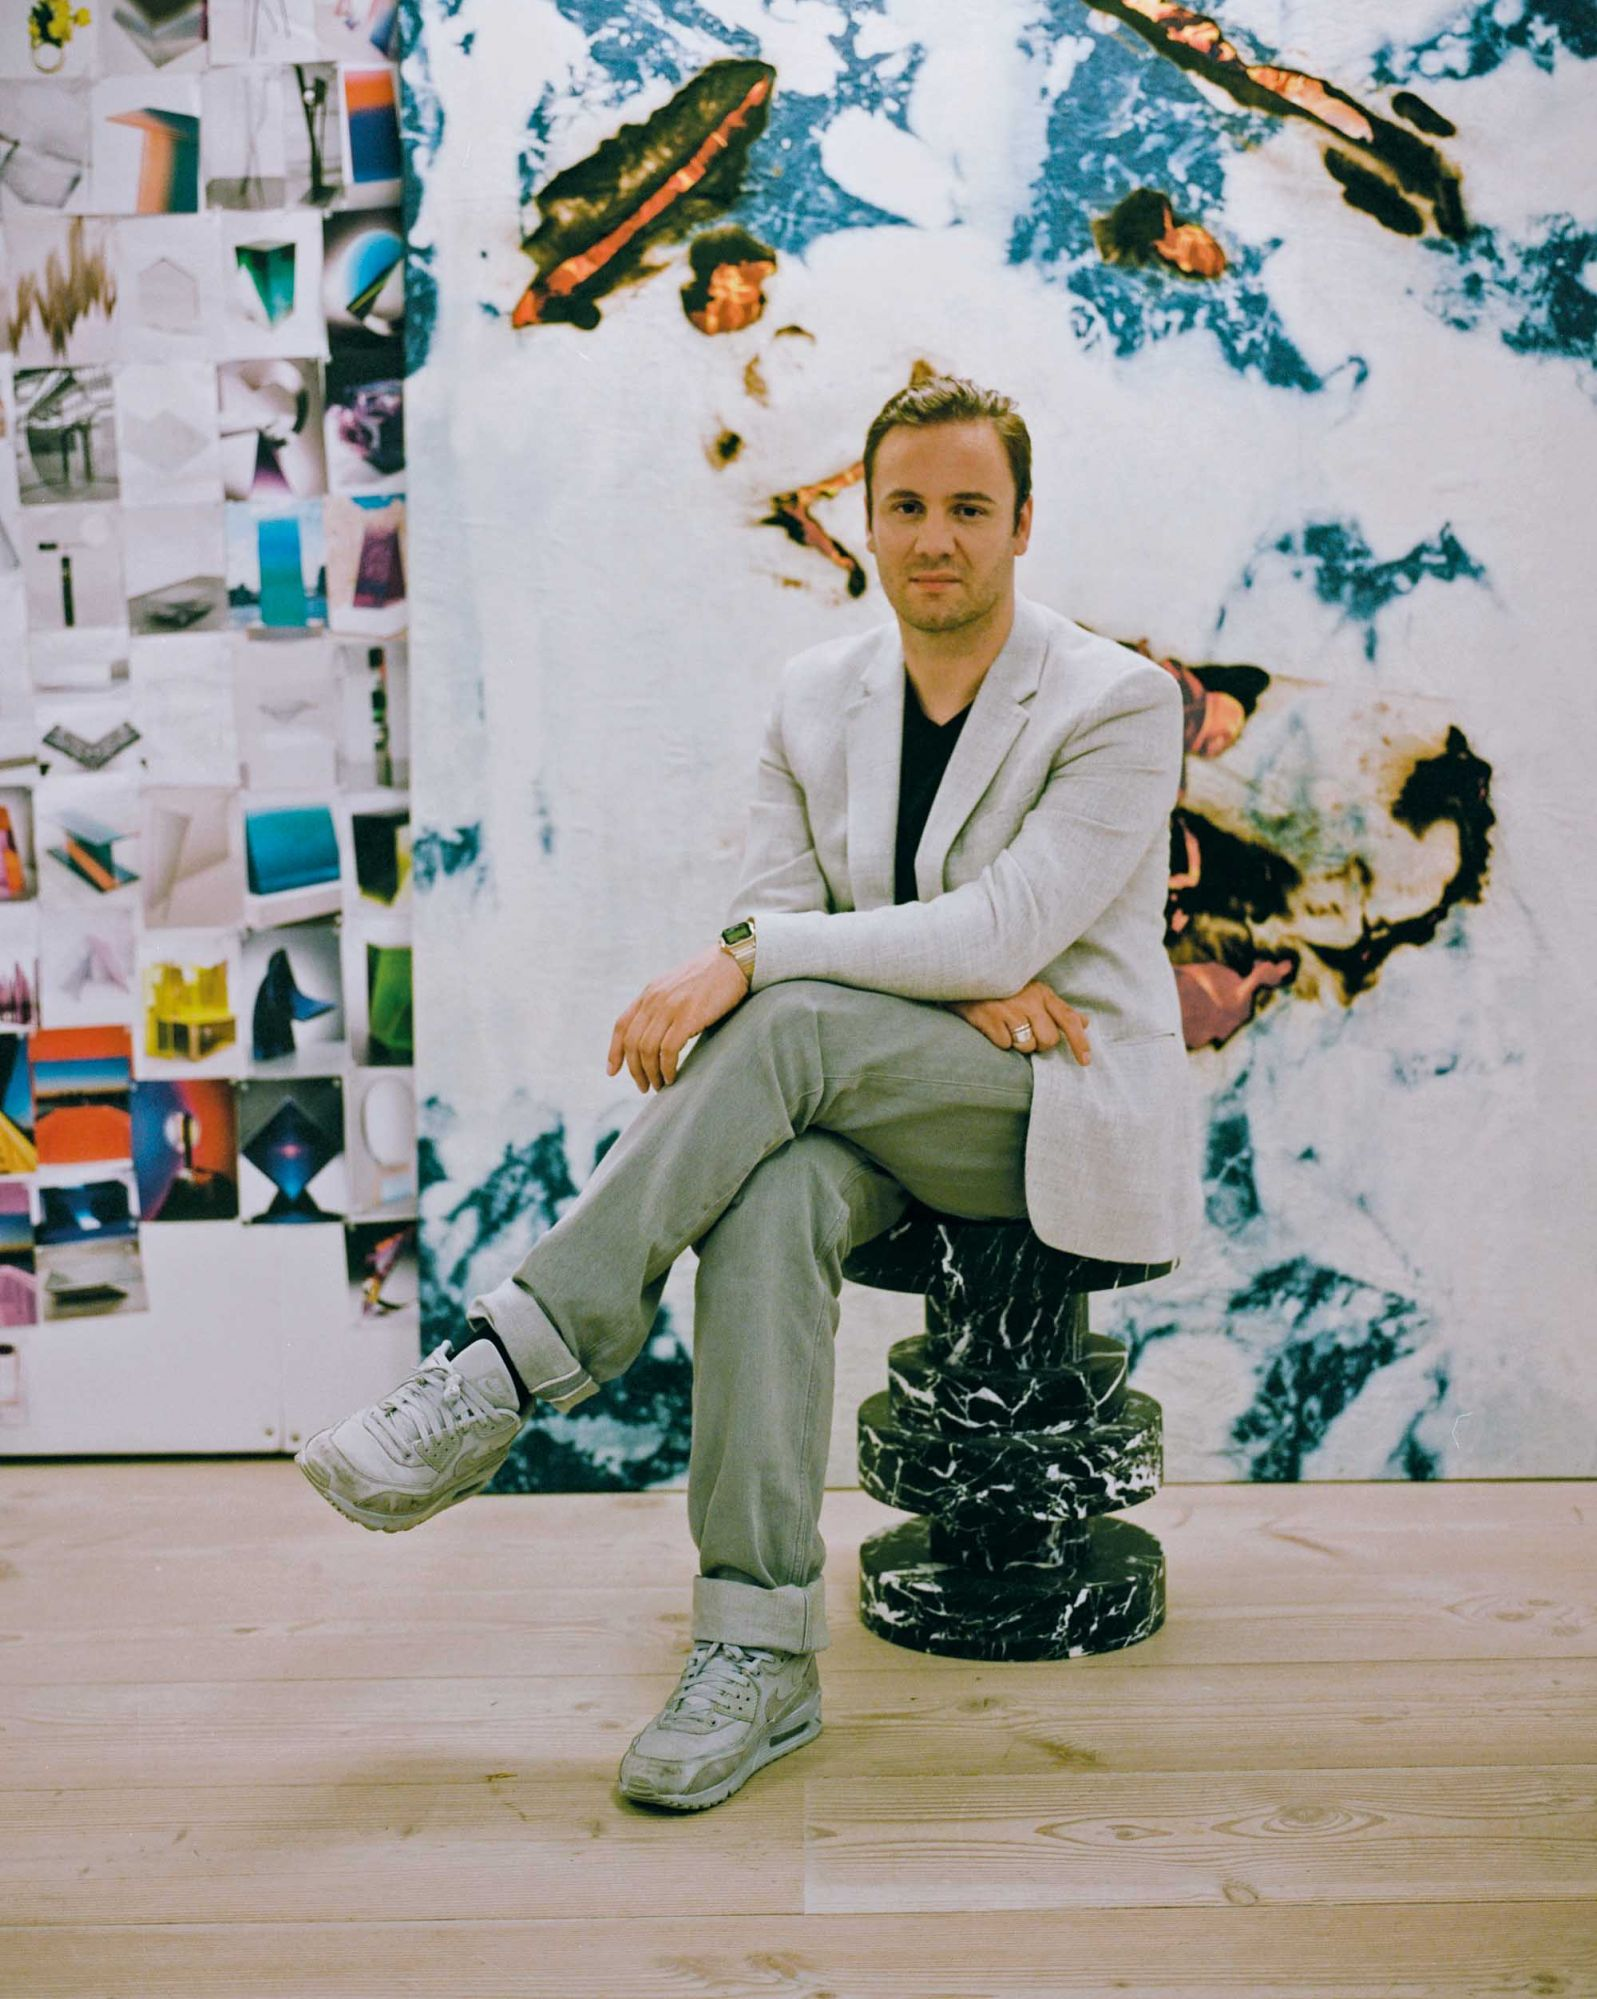 5 Minutes With... Nicholas Kirkwood, British Footwear Designer